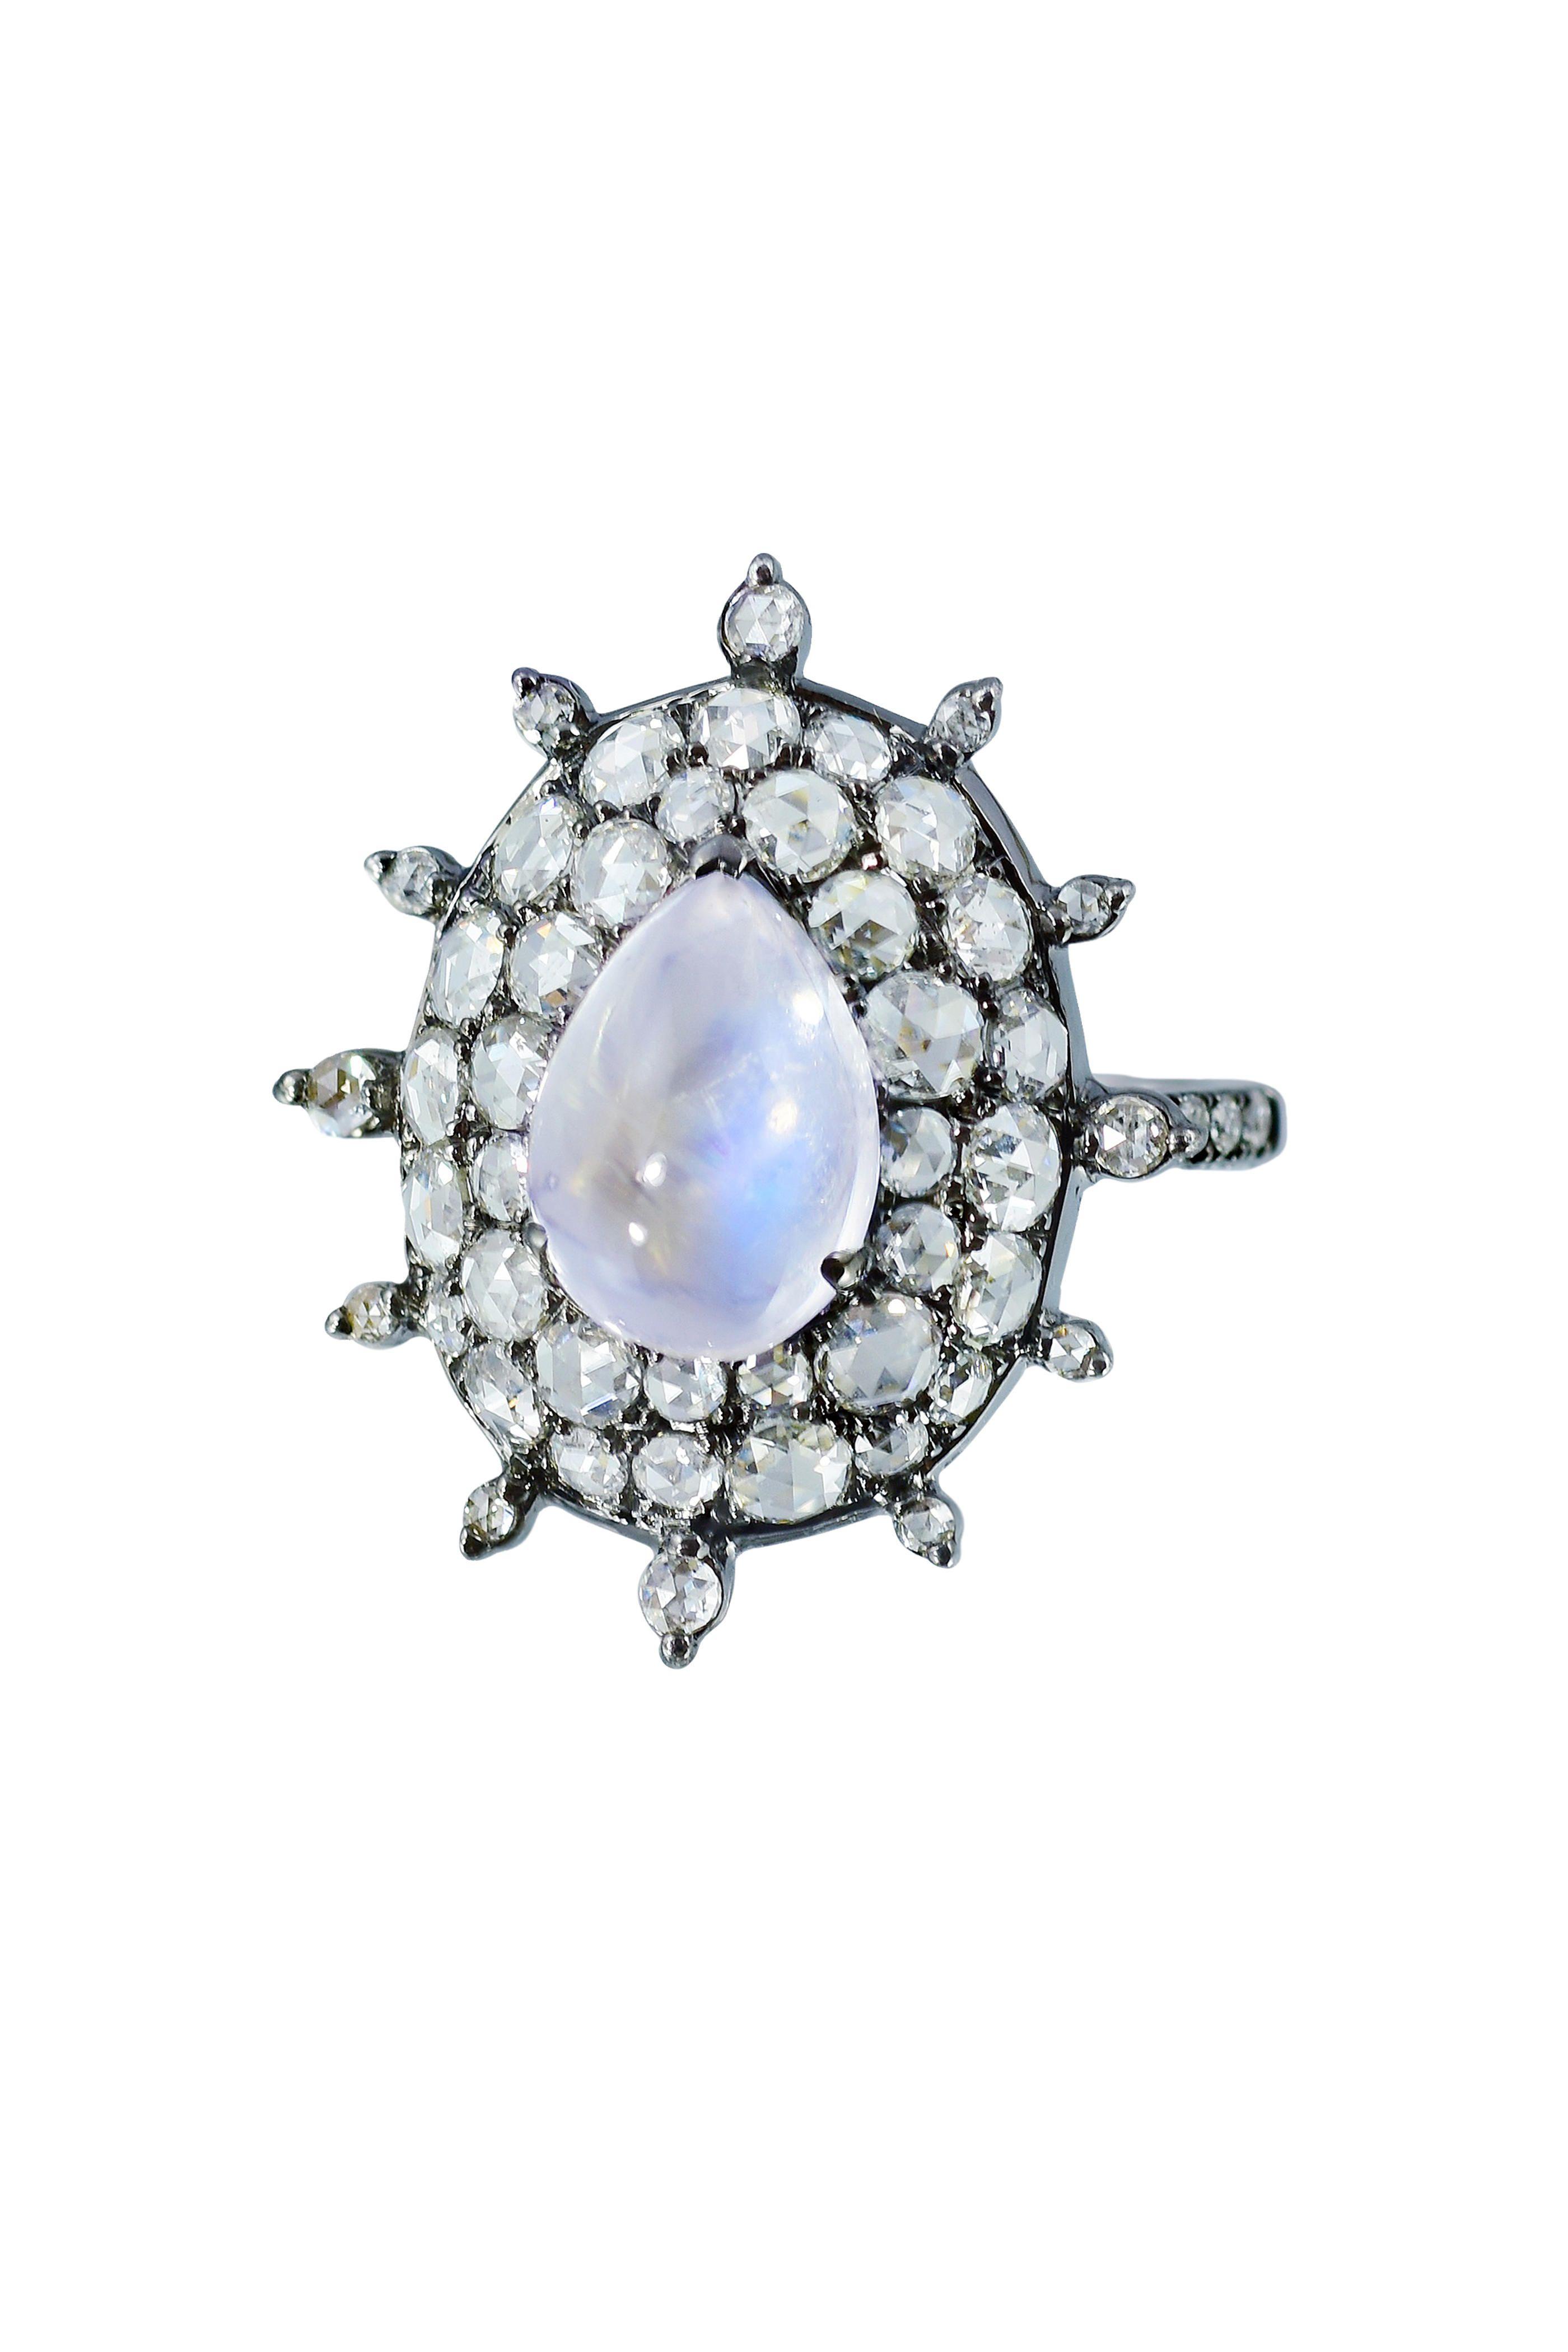 Bague En Diamant En Or Blanc 18 Carats Nam Cho uWPPtlgl